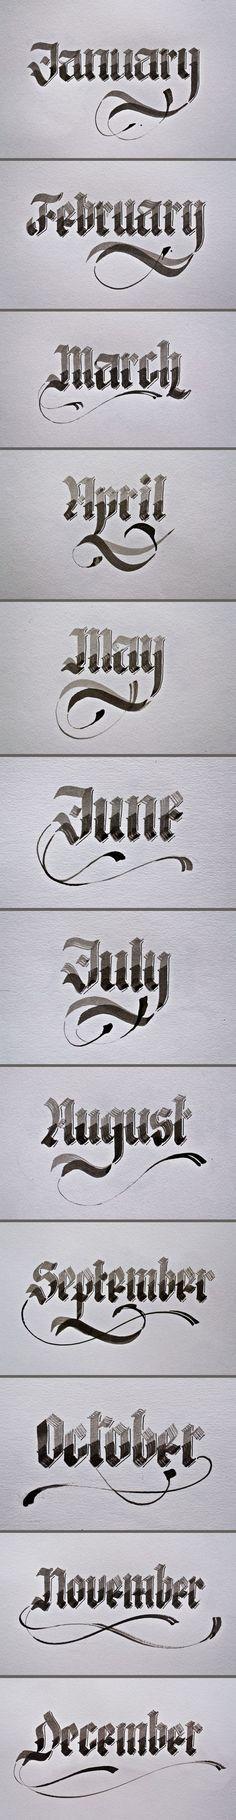 Renato Molnar #calligraphy #typography https://www.behance.net/gallery/Calligraphy/4661745